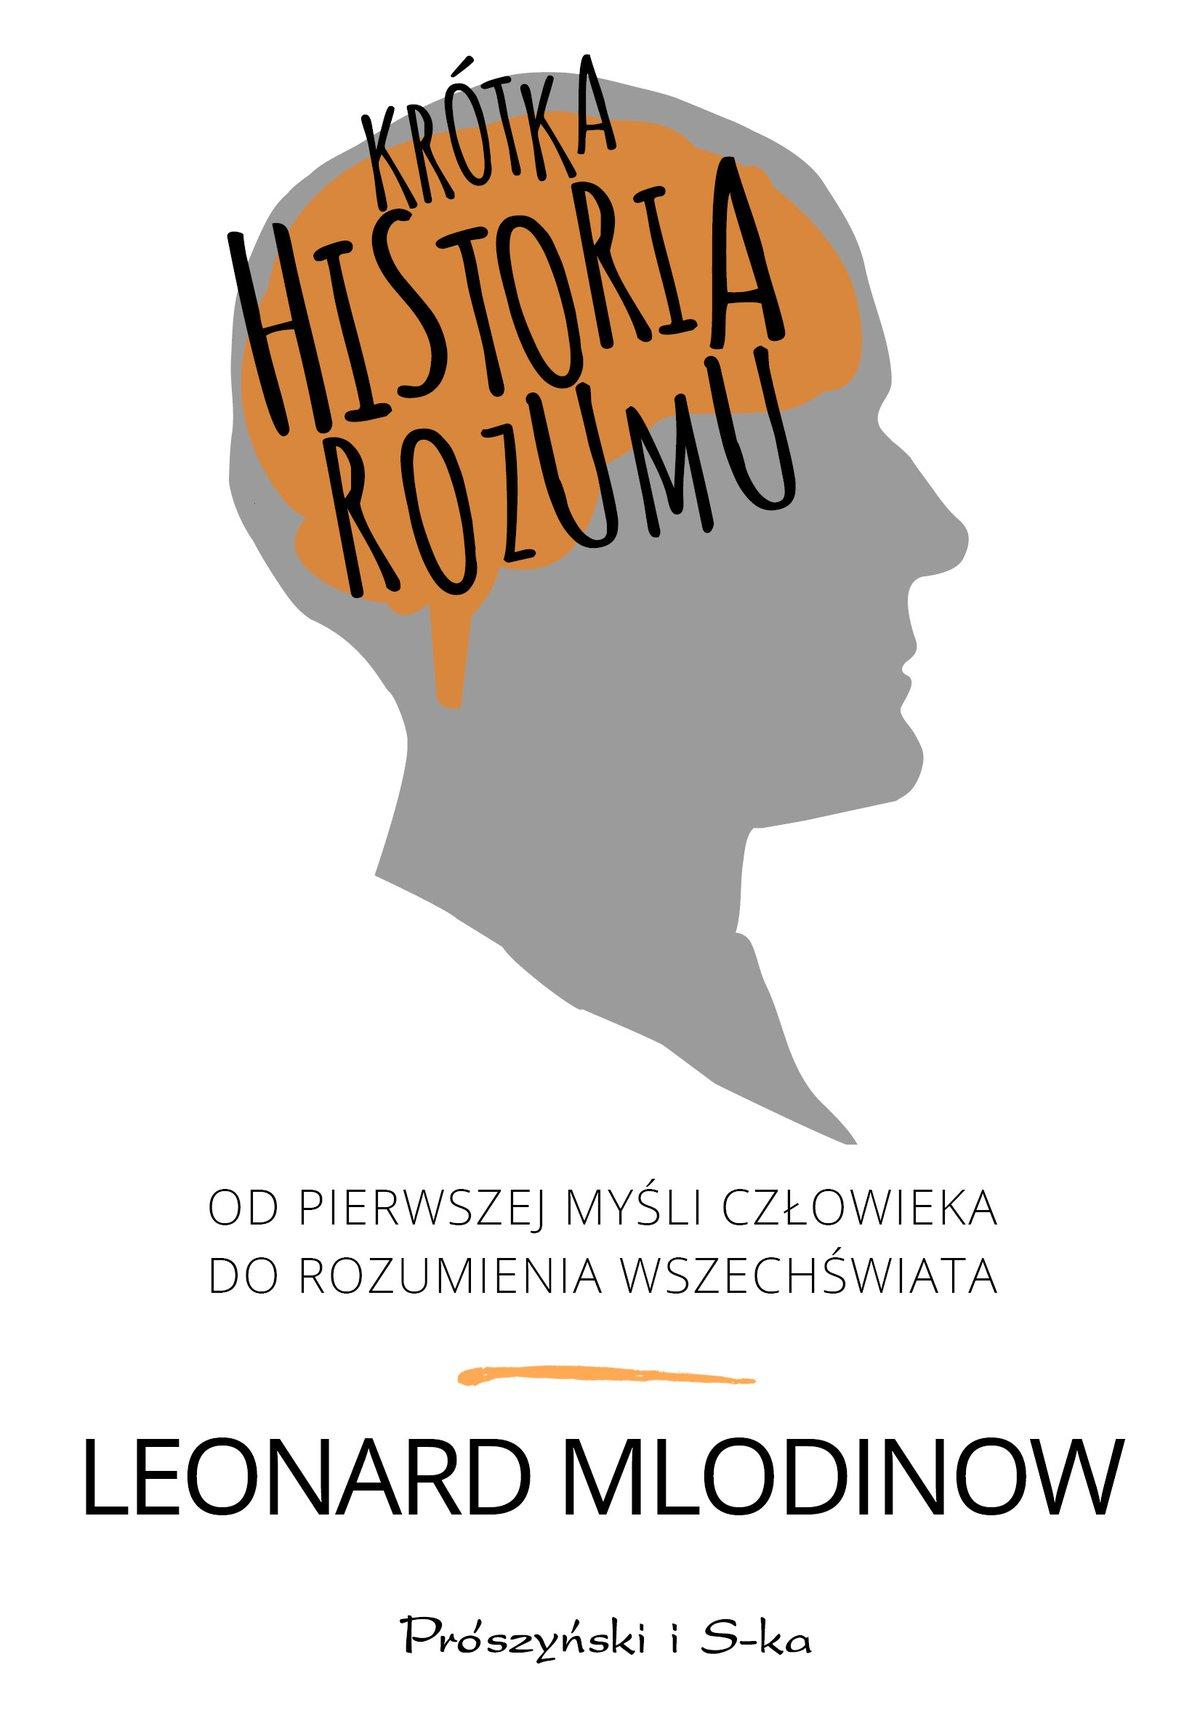 Krótka historia rozumu - Ebook (Książka na Kindle) do pobrania w formacie MOBI